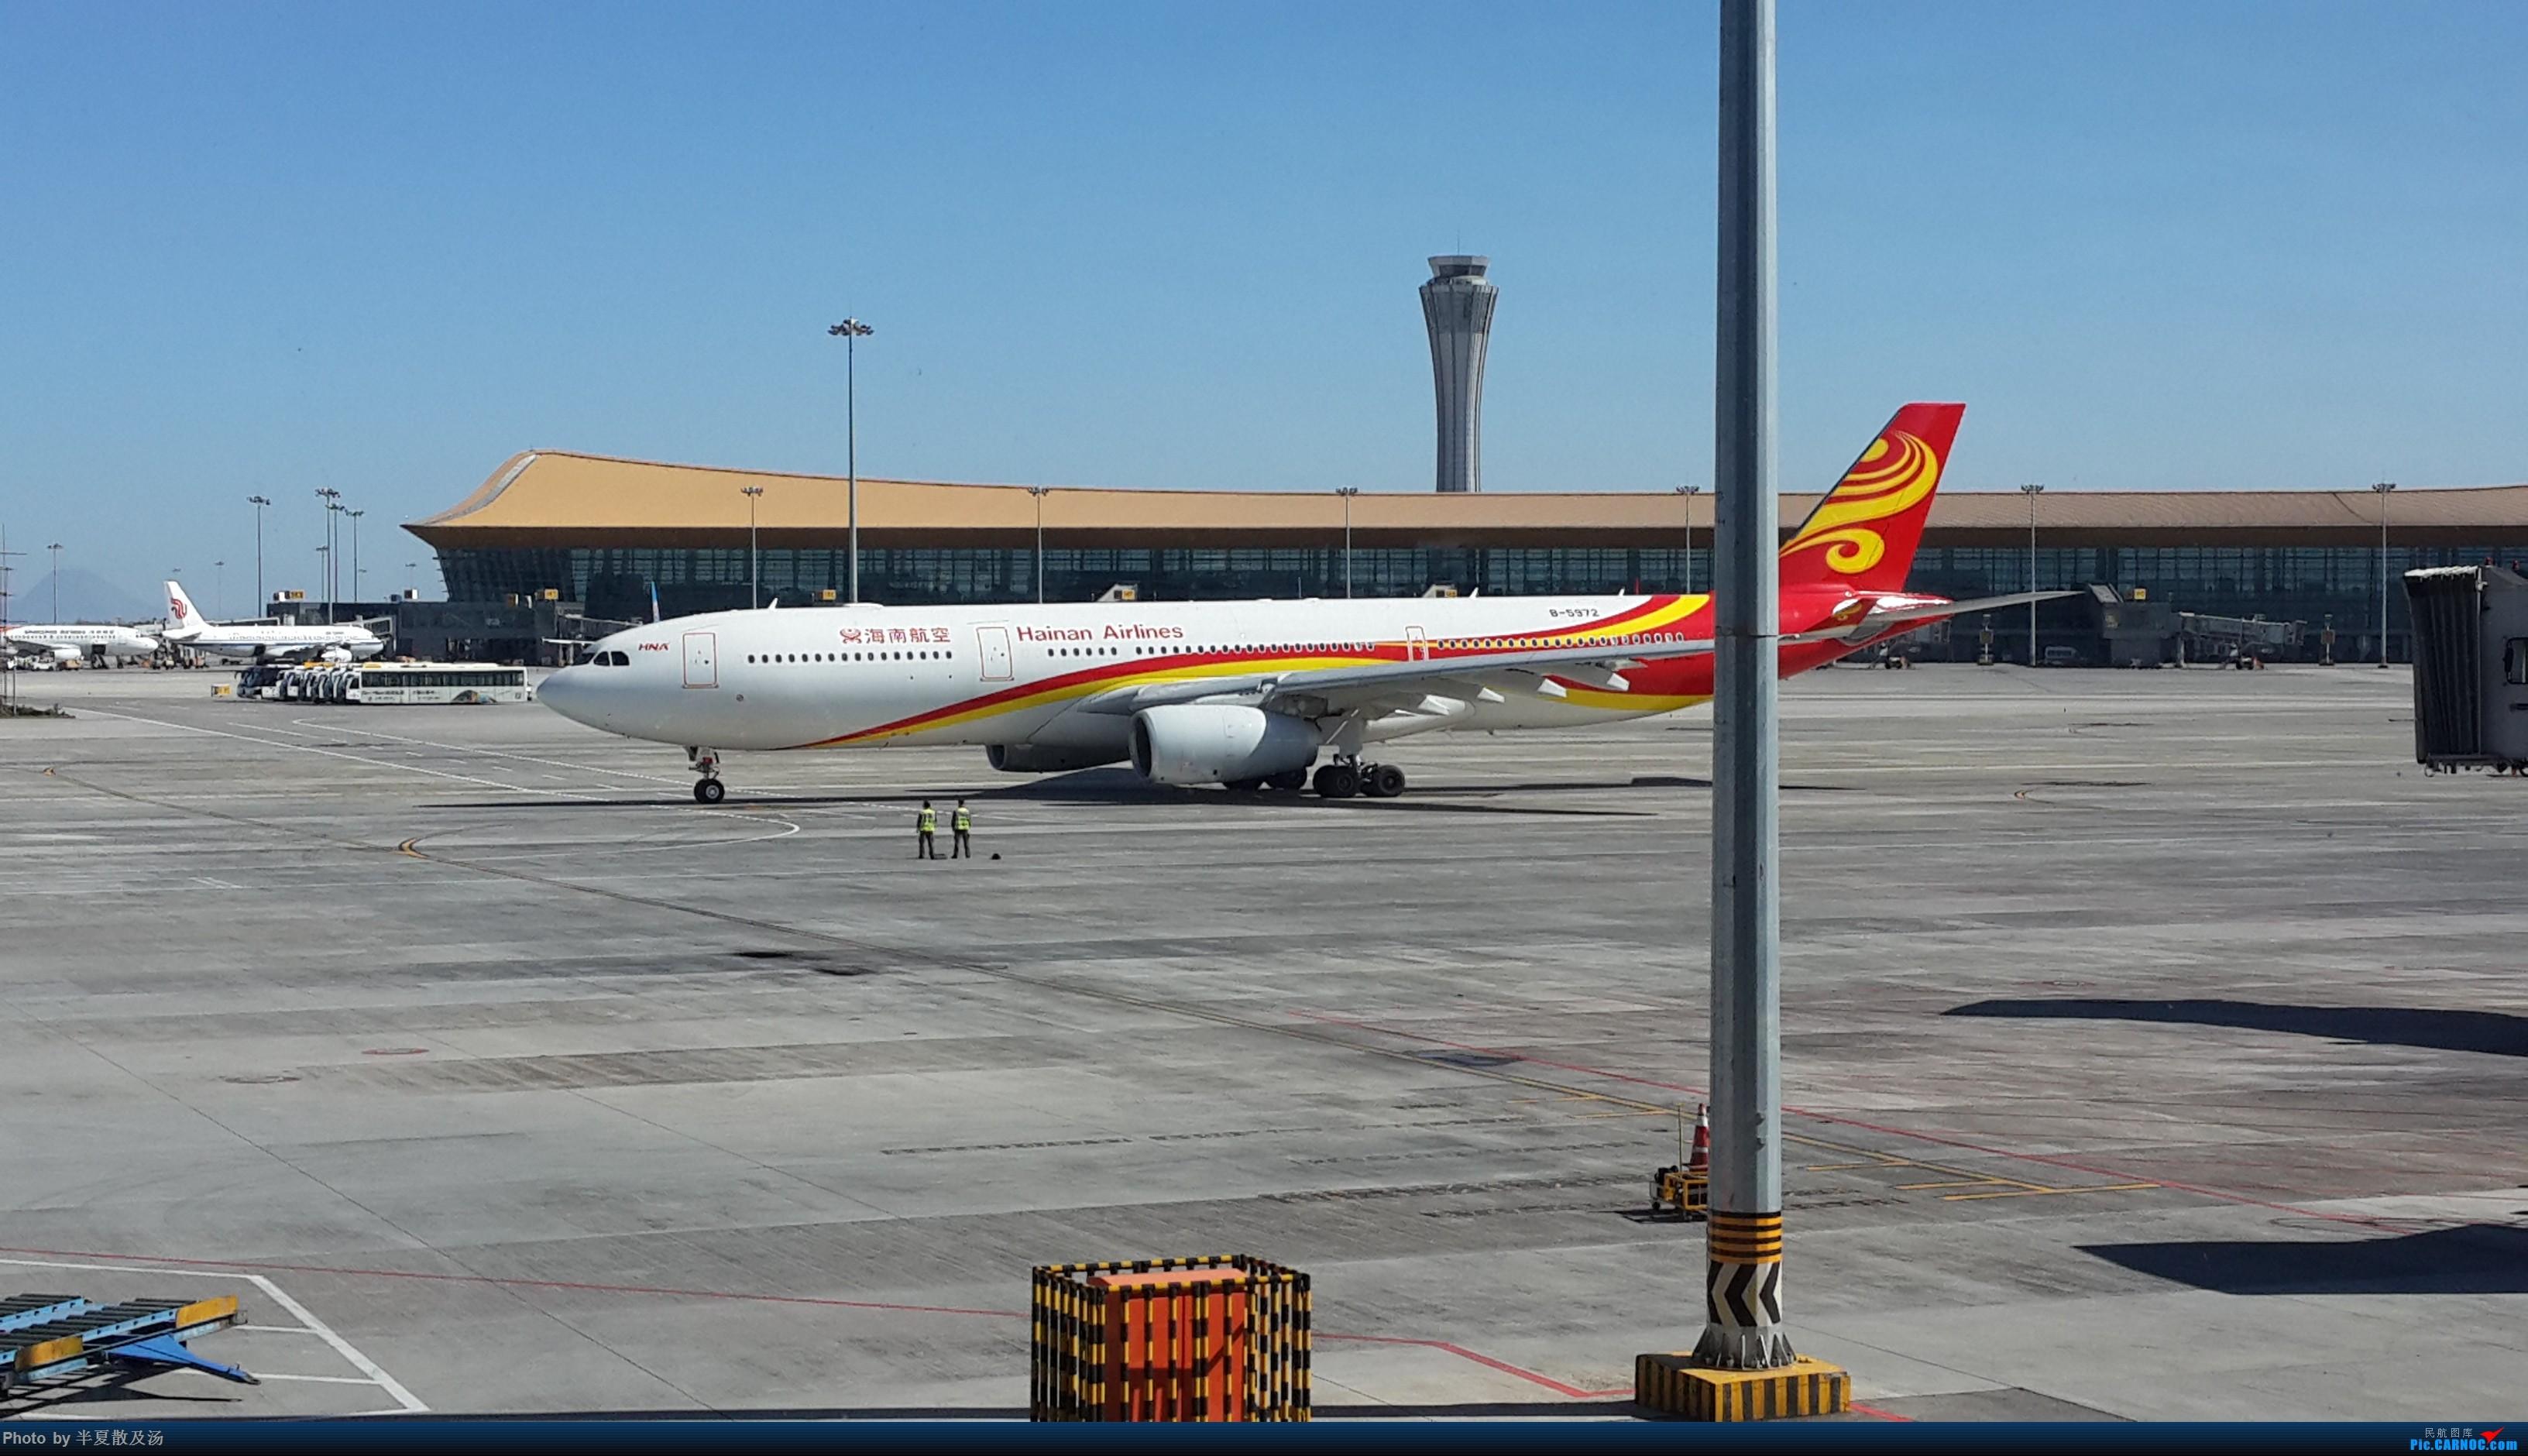 Re:[原创]A380主轮降温作业,道格拉斯抱轮车,747、330,多图 AIRBUS A330-300 B-5972 中国昆明长水国际机场